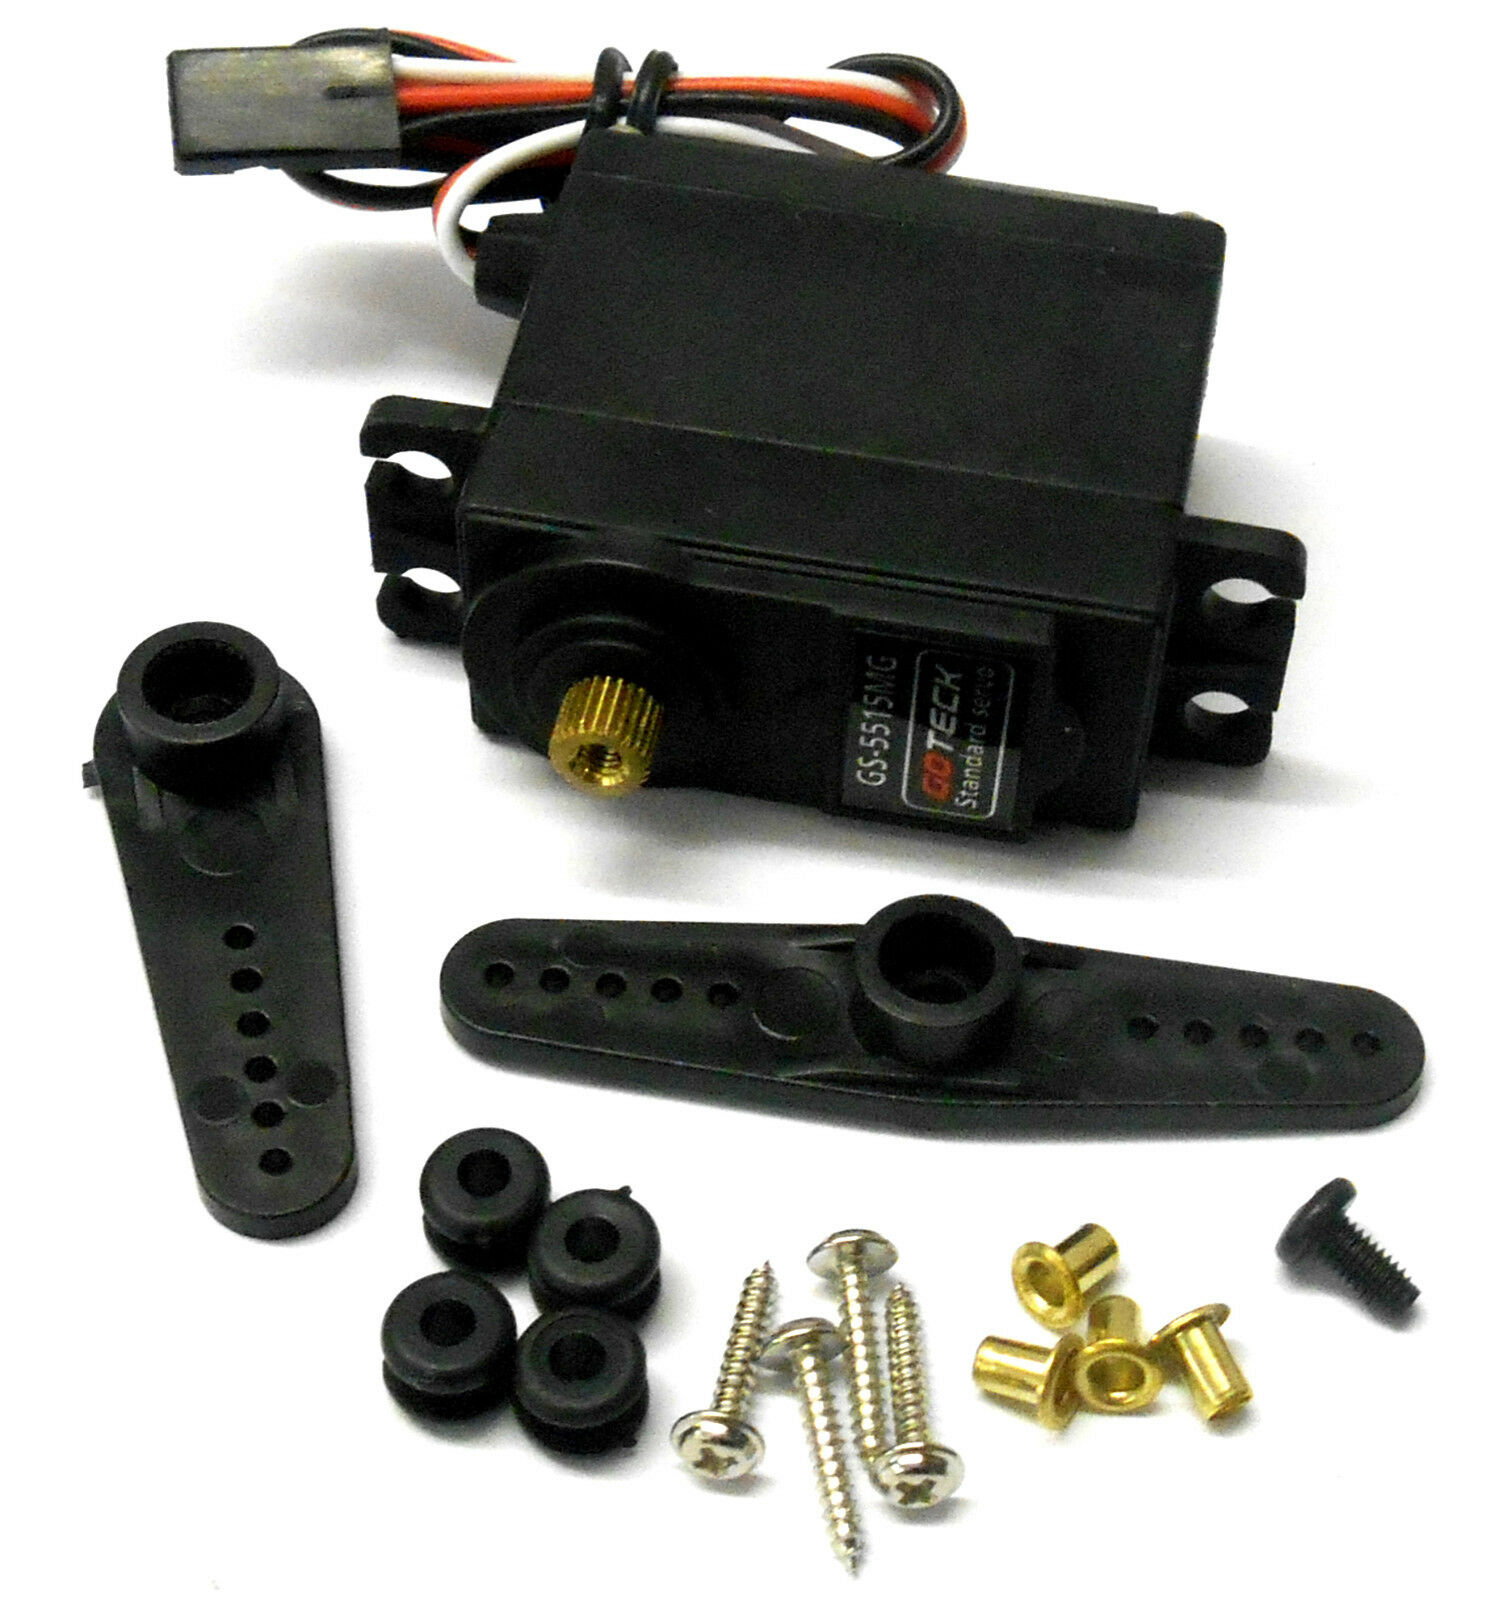 GS-5515MG 15kg High Torque Thredtle Steering RC Servo Metal Gears x 4